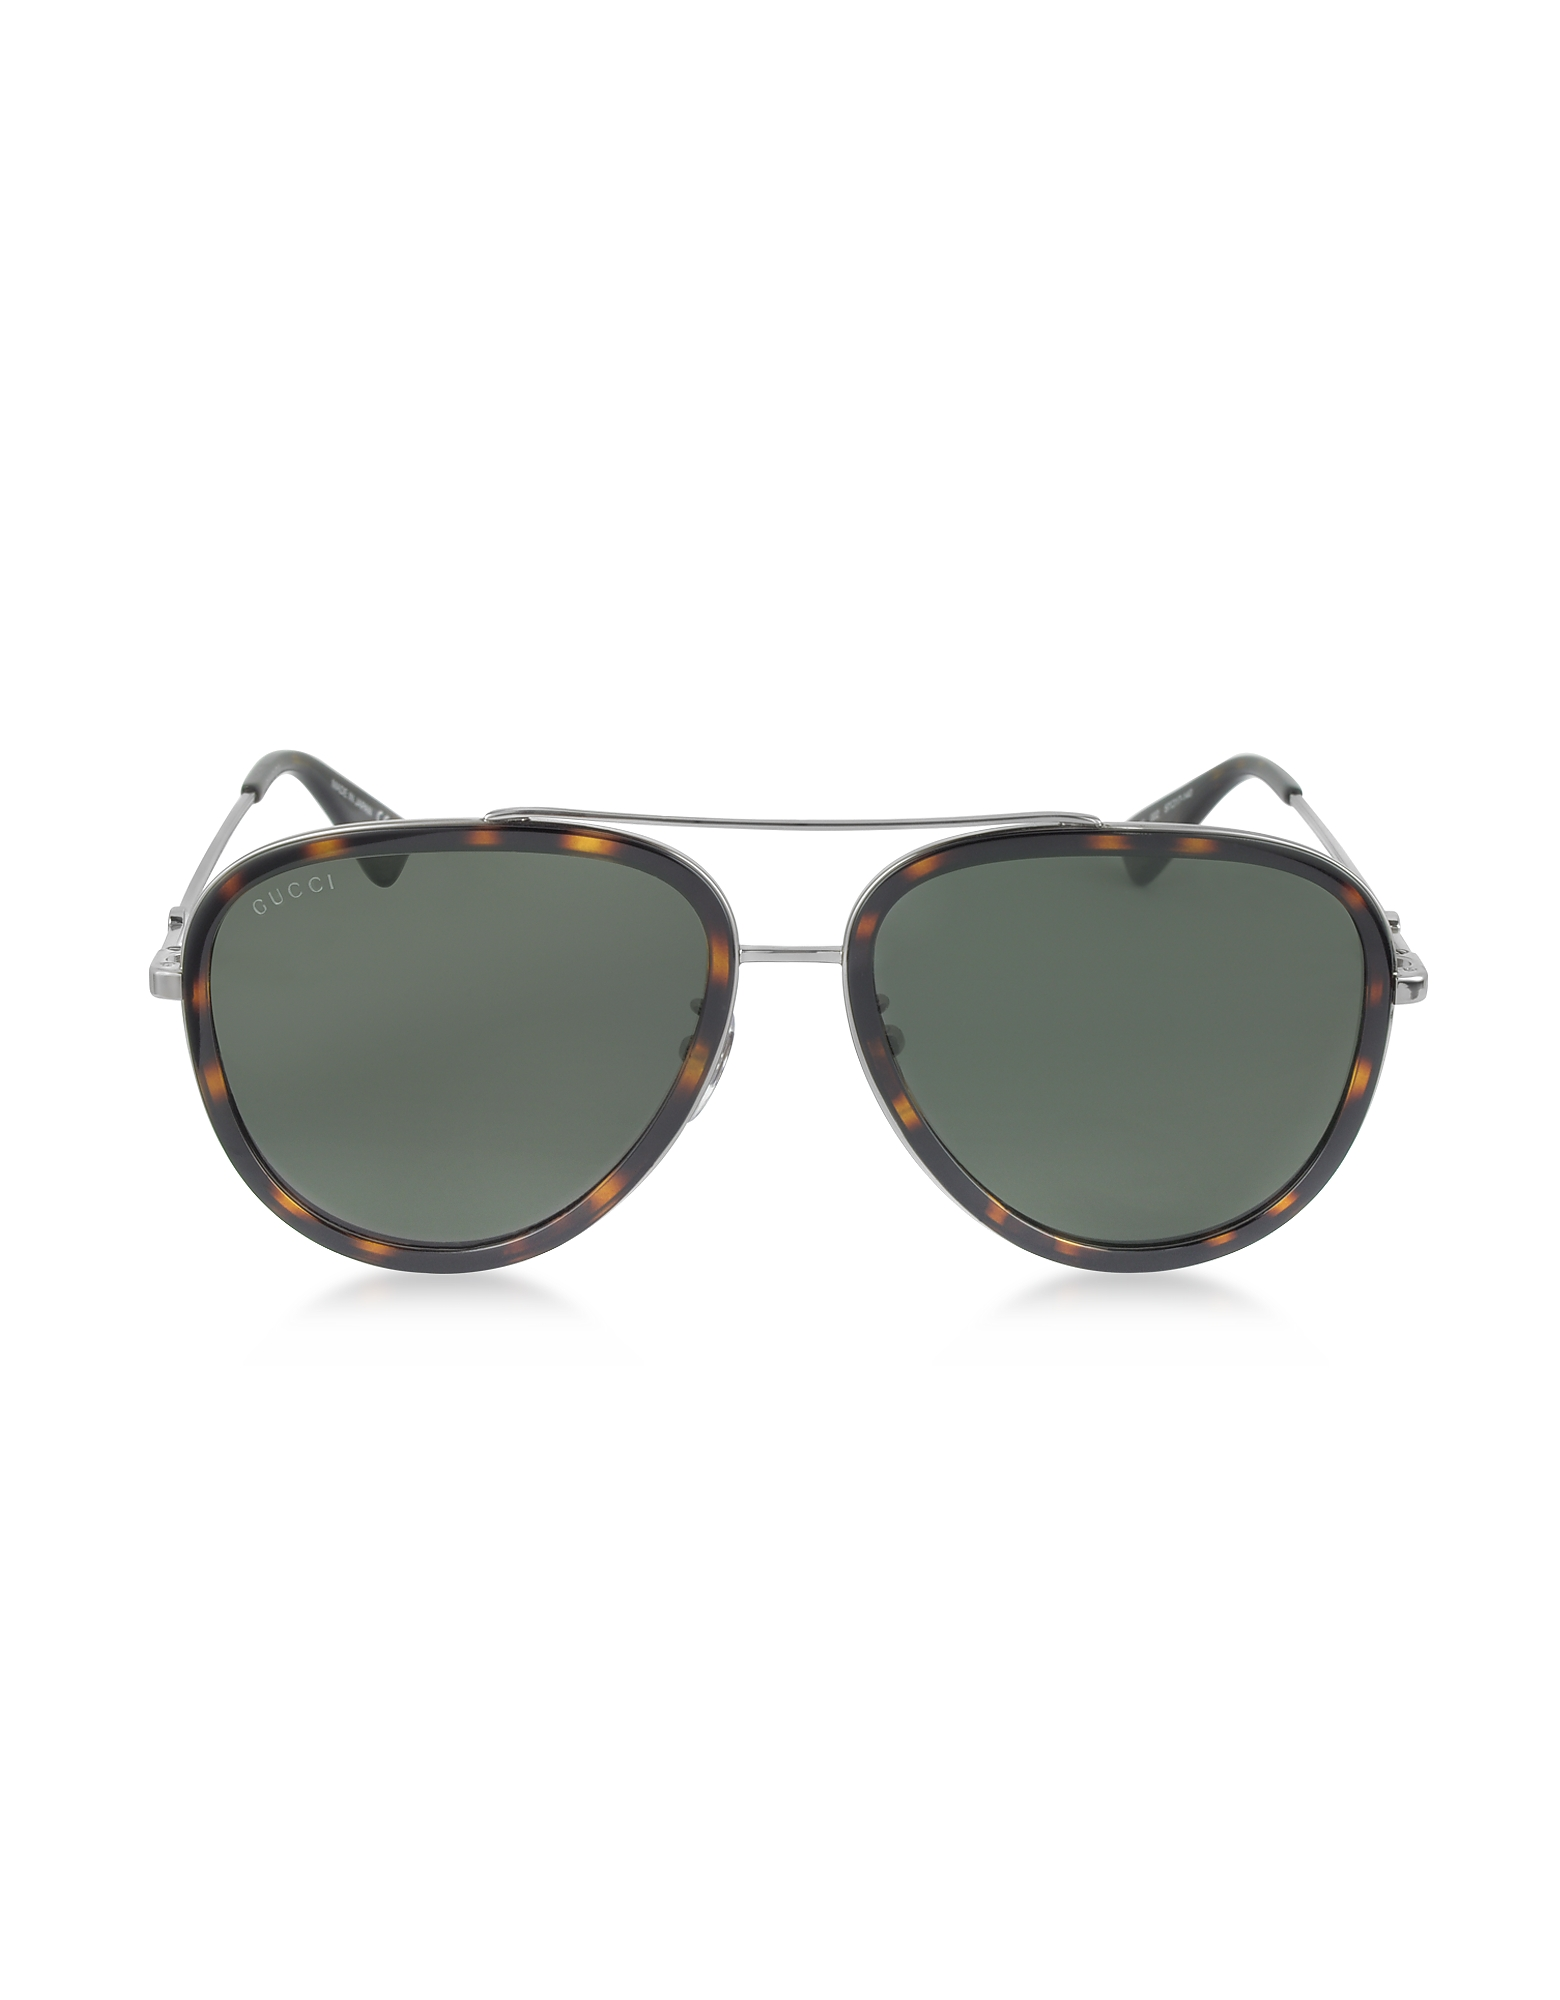 Gucci Designer Sunglasses, GG0062S 002 Havana Acetate and Silver Metal Aviator Women's Sunglasses